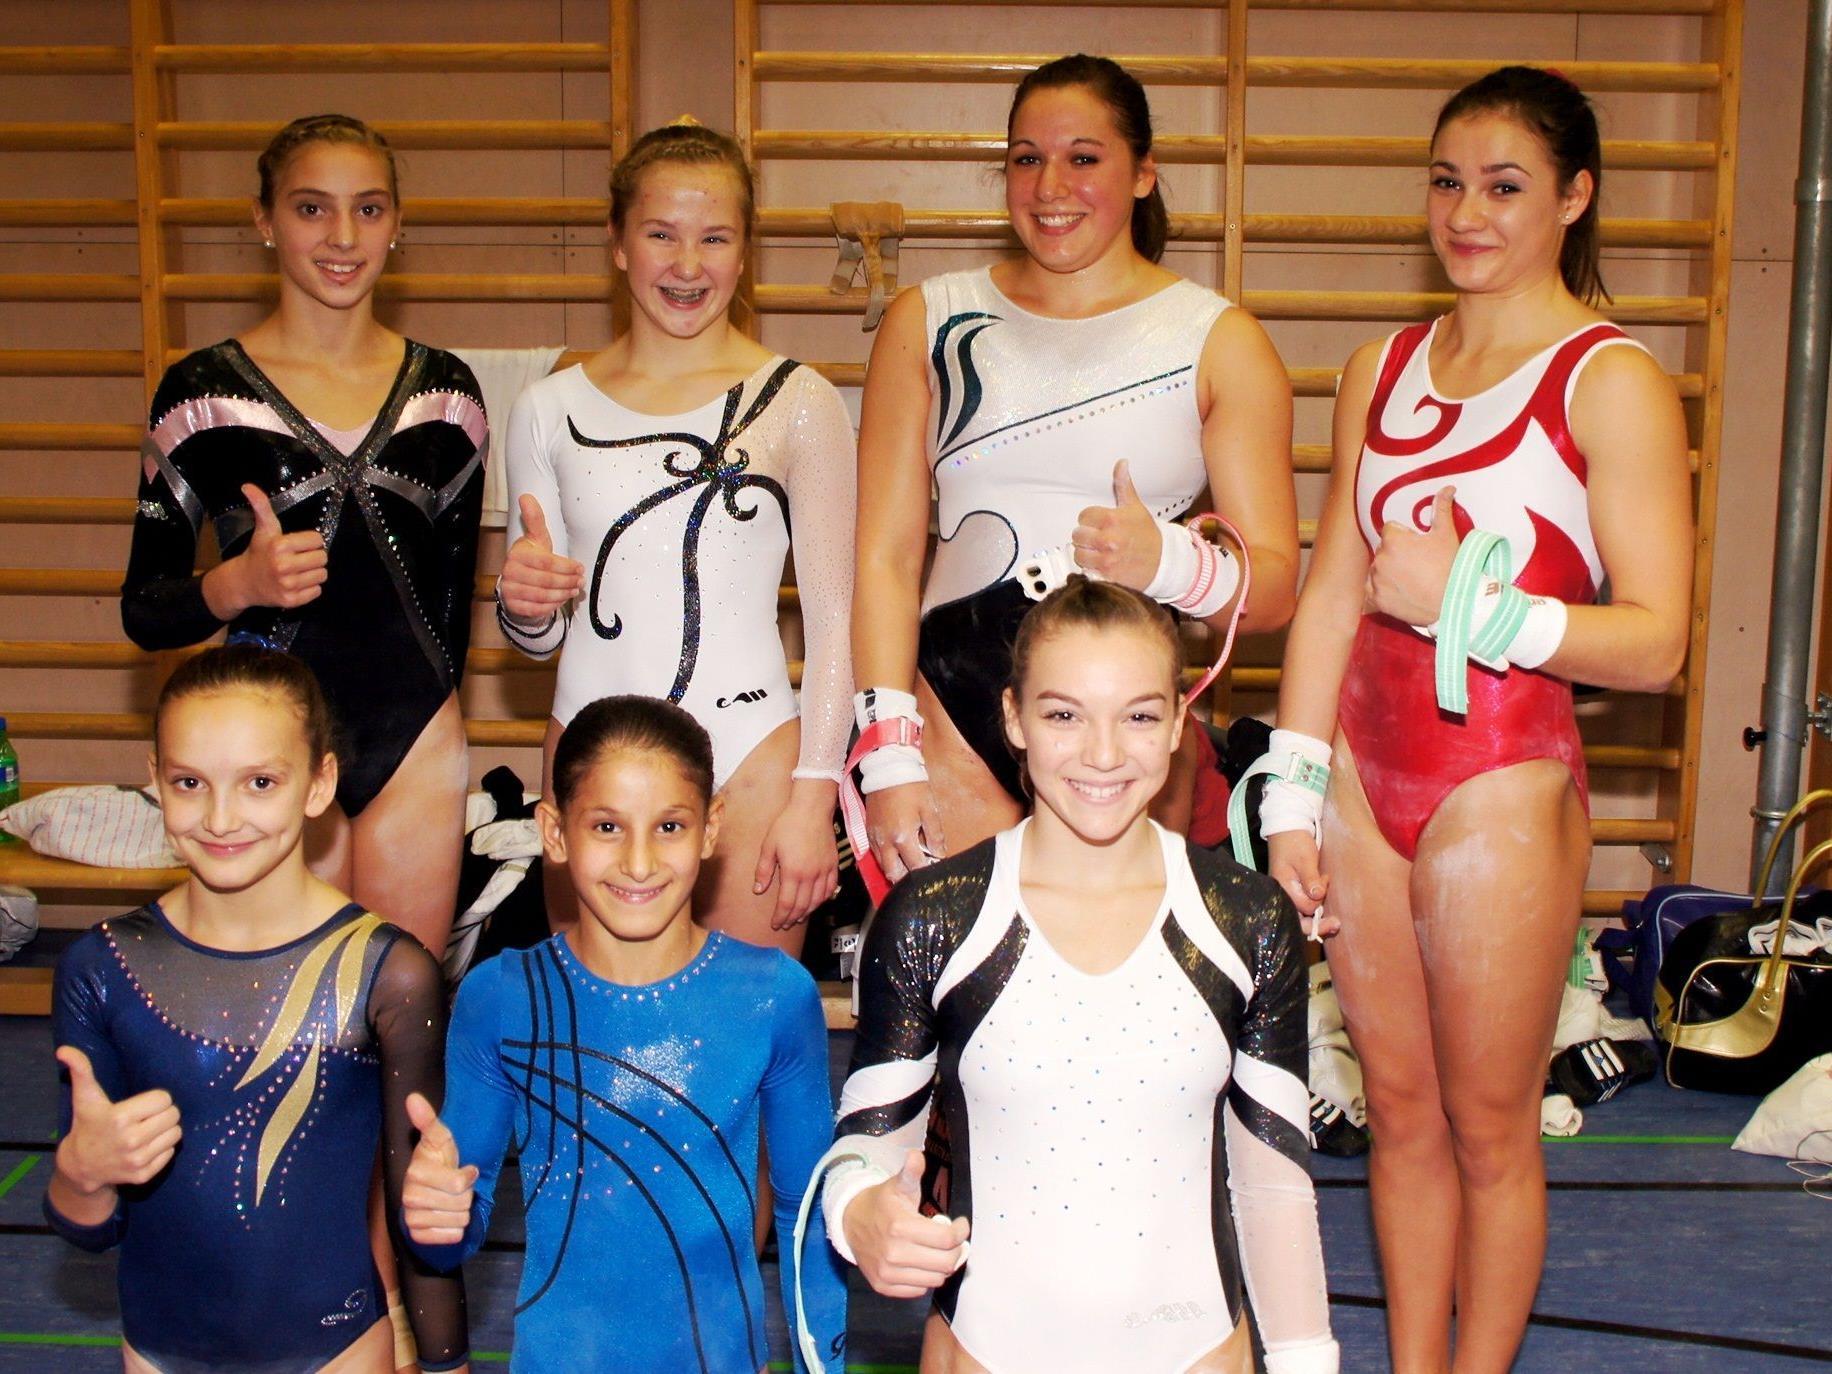 Selina, Kerstin, Katharina, Erja, Tamara, Elisa, Georgiana